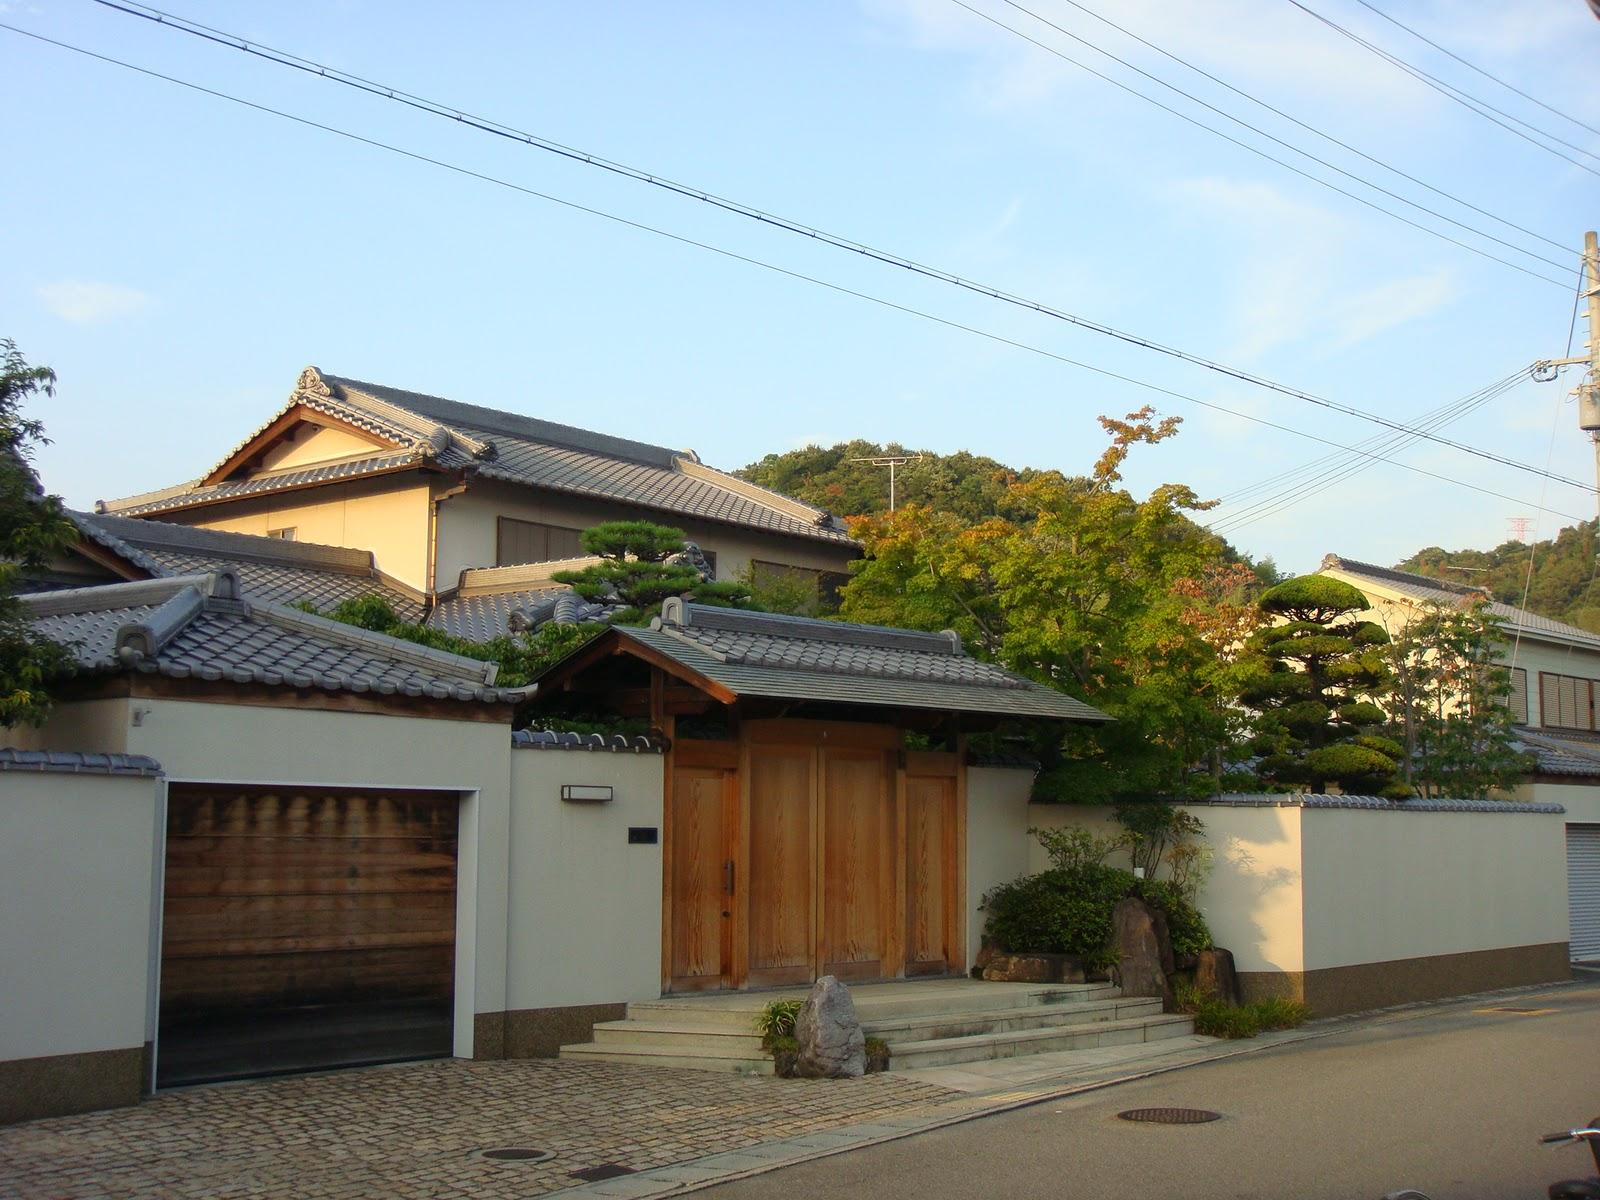 Karolina chokyu casas japonesas japanese house - Casa tradicional japonesa ...